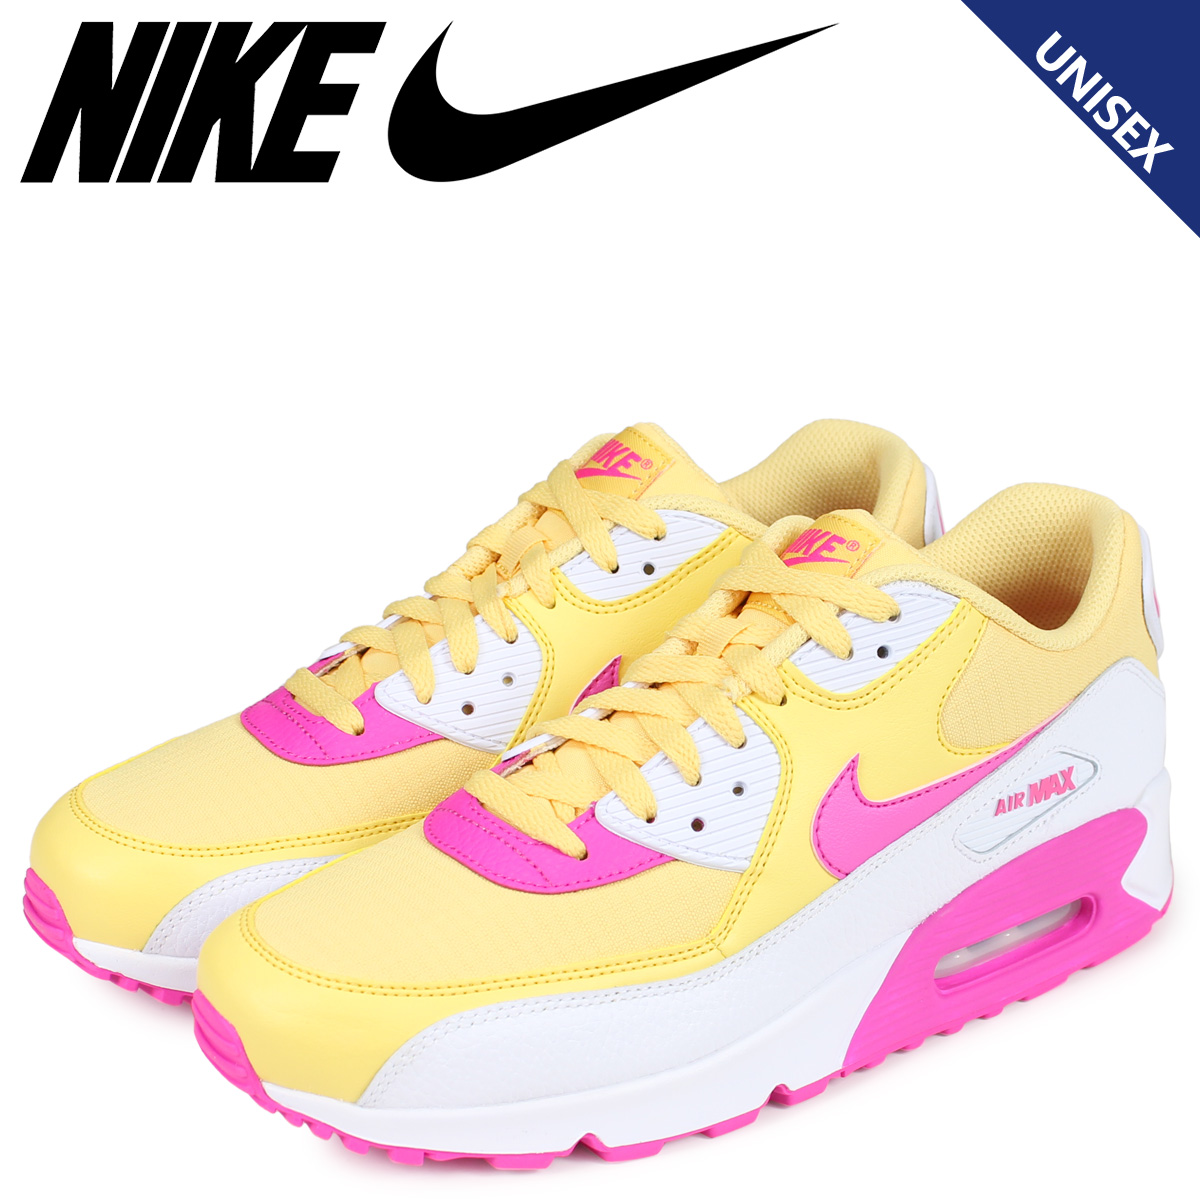 bca448bfe8 NIKE Kie Ney AMAX 90 sneakers men gap Dis WMNS AIR MAX 90 yellow 325,213-  ...